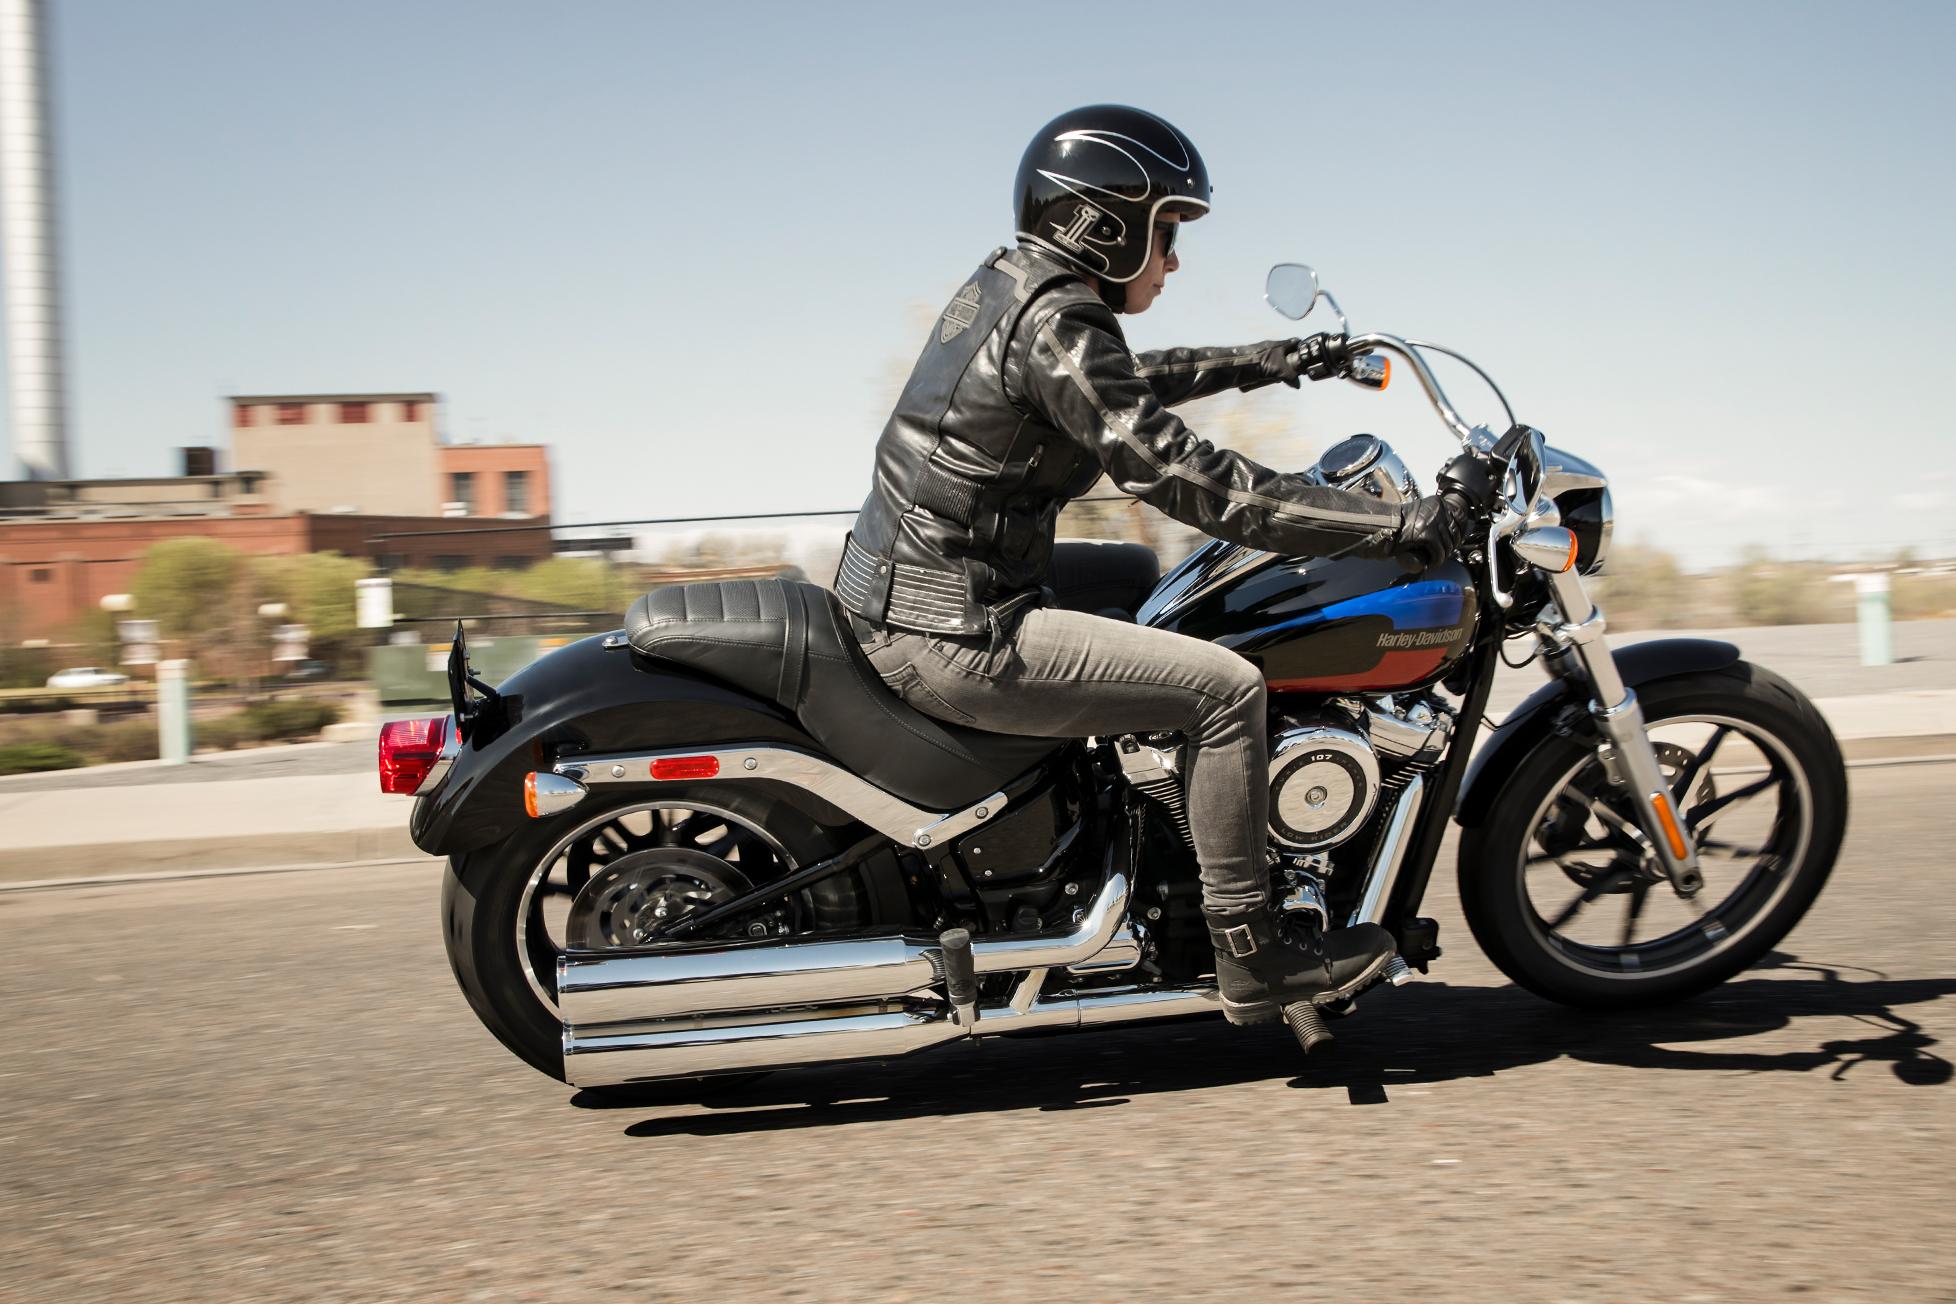 Harley low rider